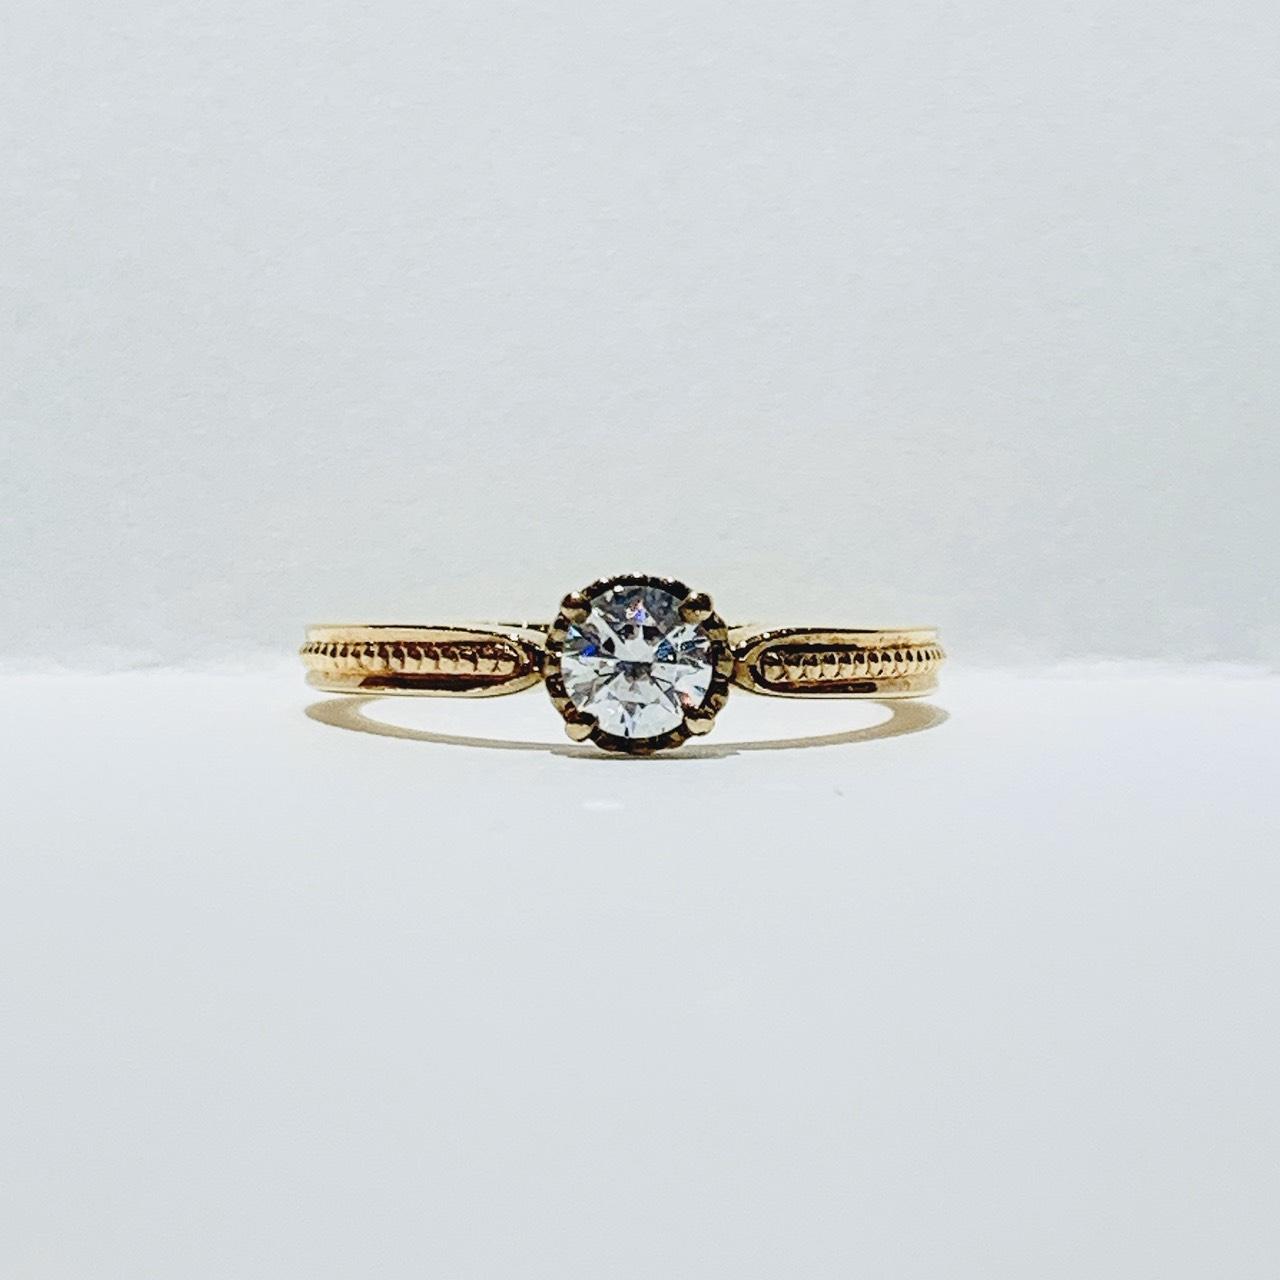 BROOCH 婚約指輪 エンゲージリング アンティーク調デザイン